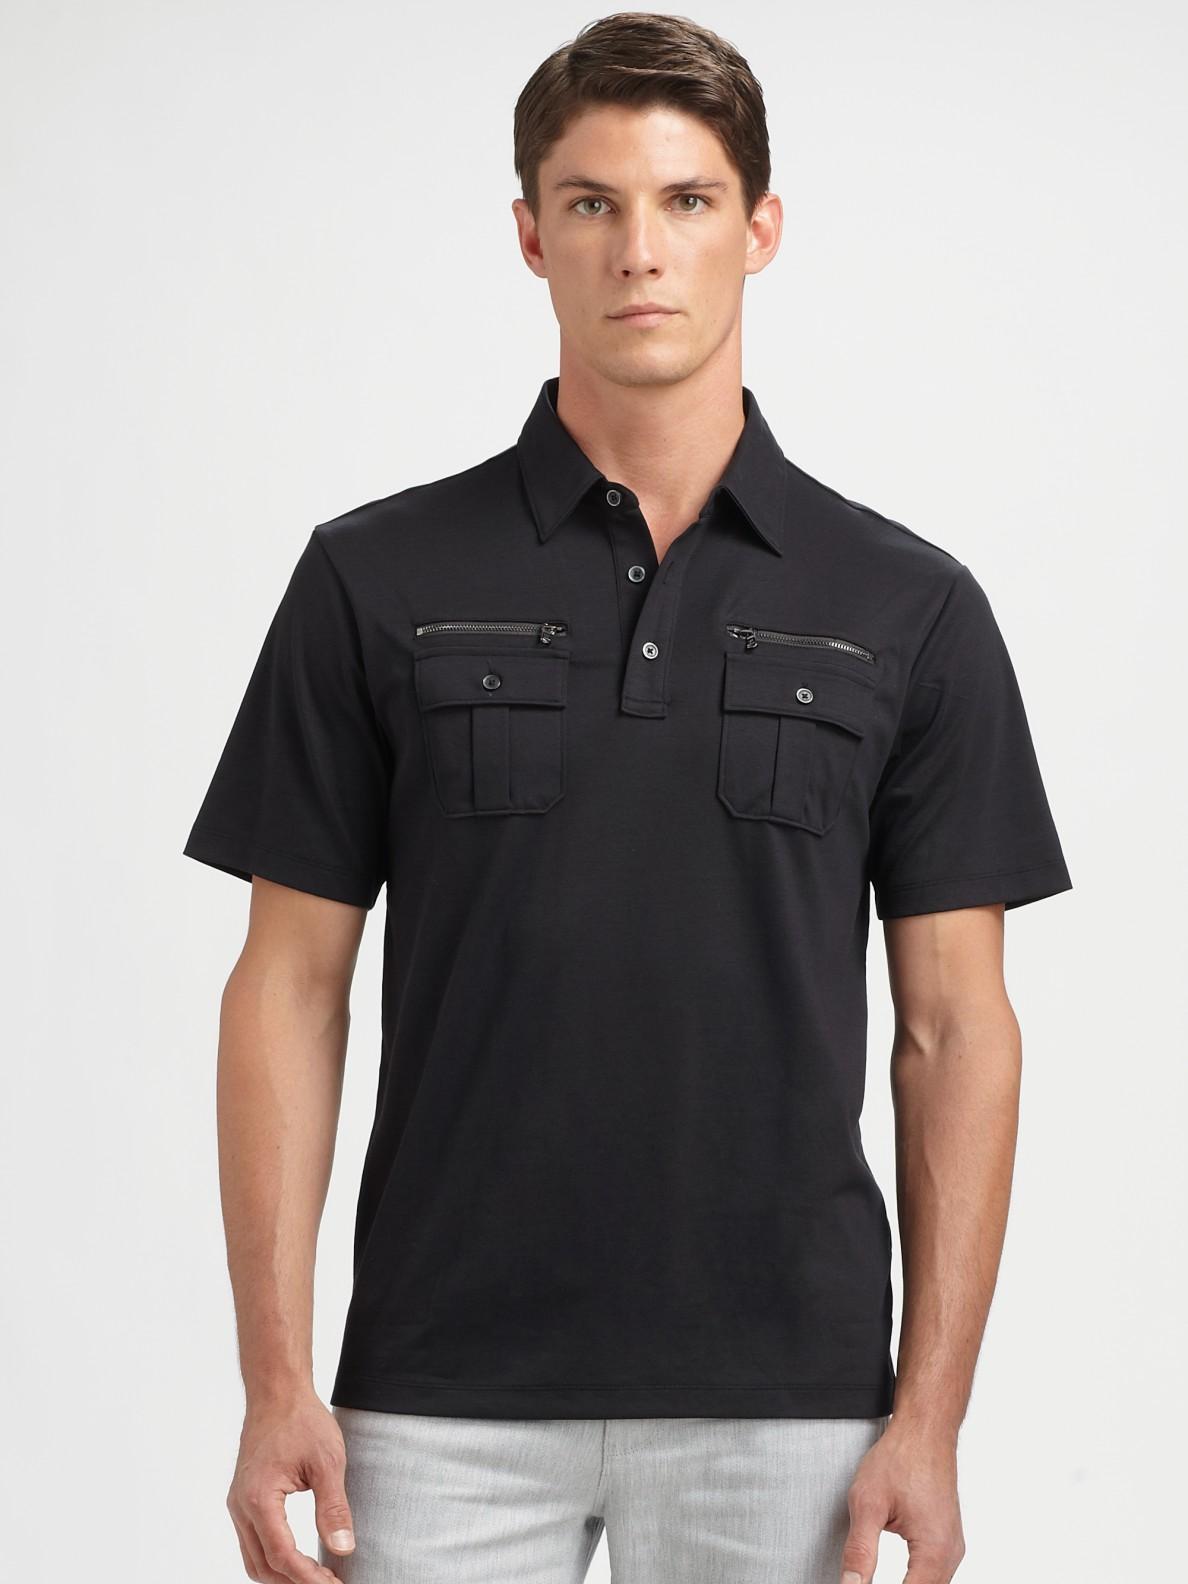 Zipper Pocket Polo Shirt